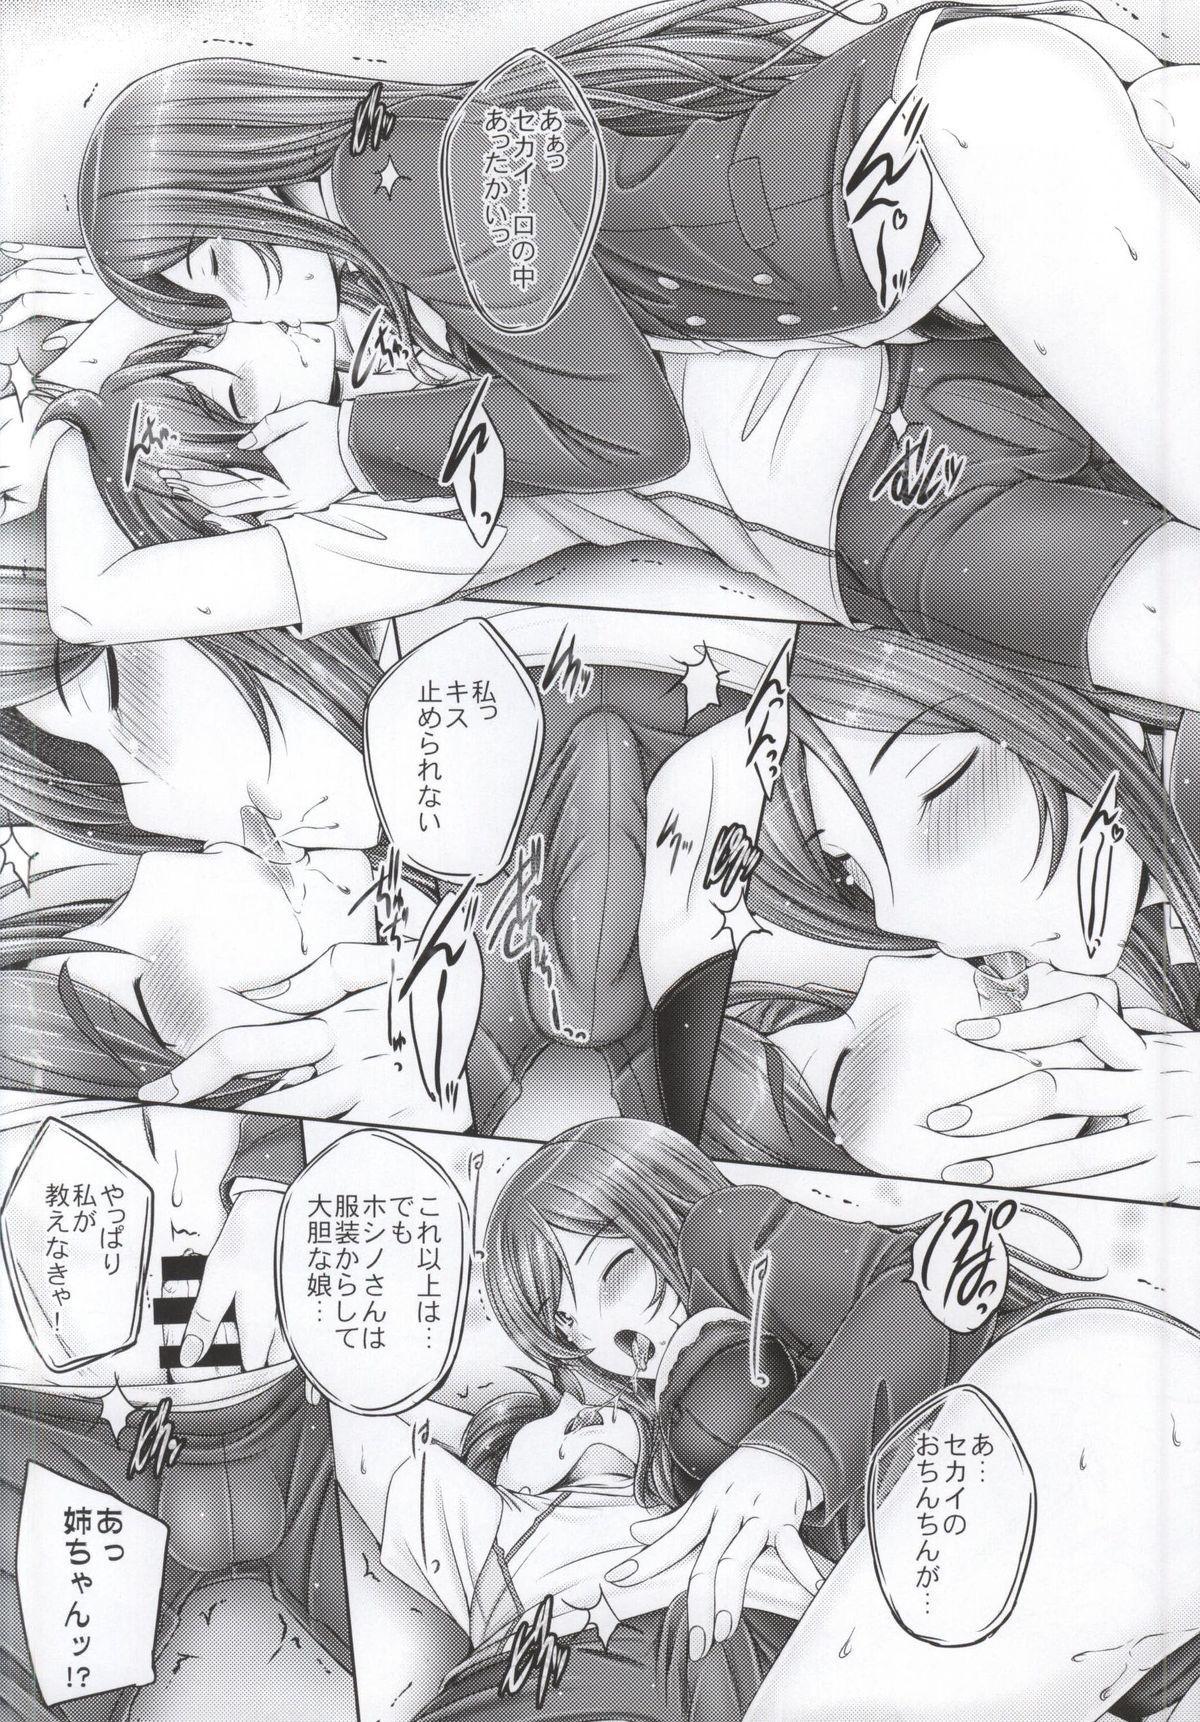 Mirai no Shoudouteki na Machigai 4